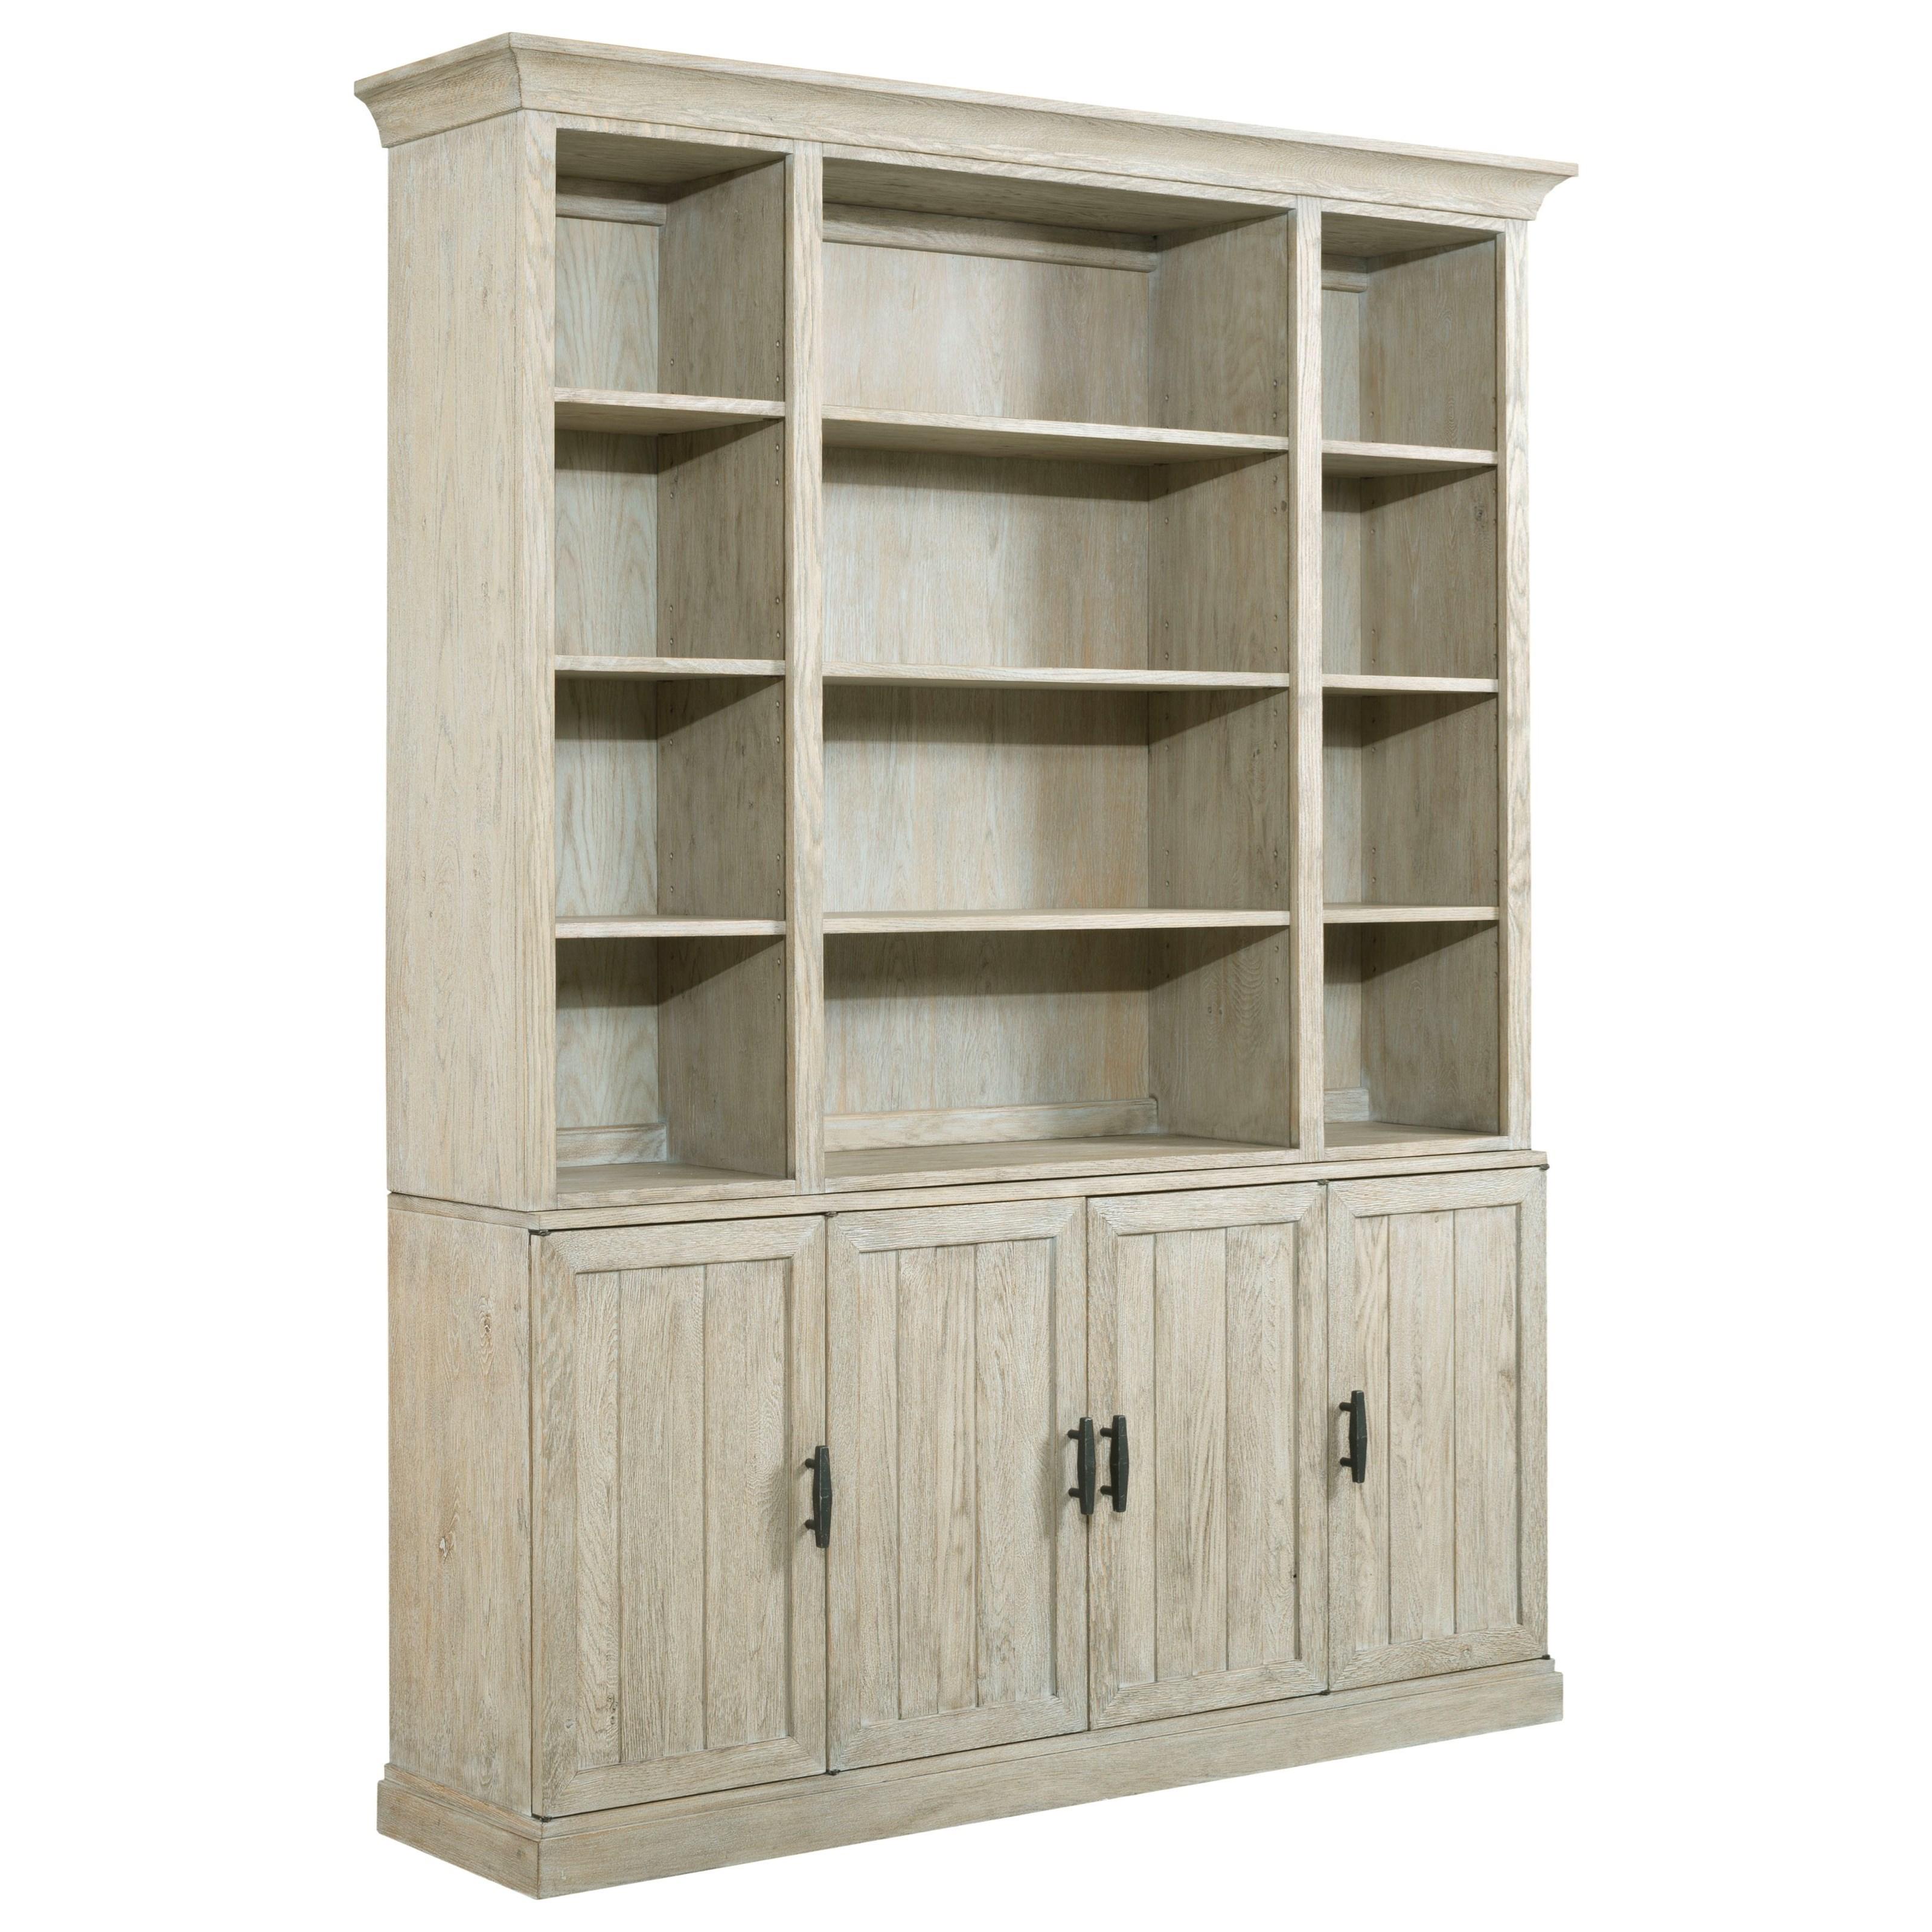 Etonnant Kincaid Furniture Trails Redmond China Cabinet   Item Number: 813 830SP